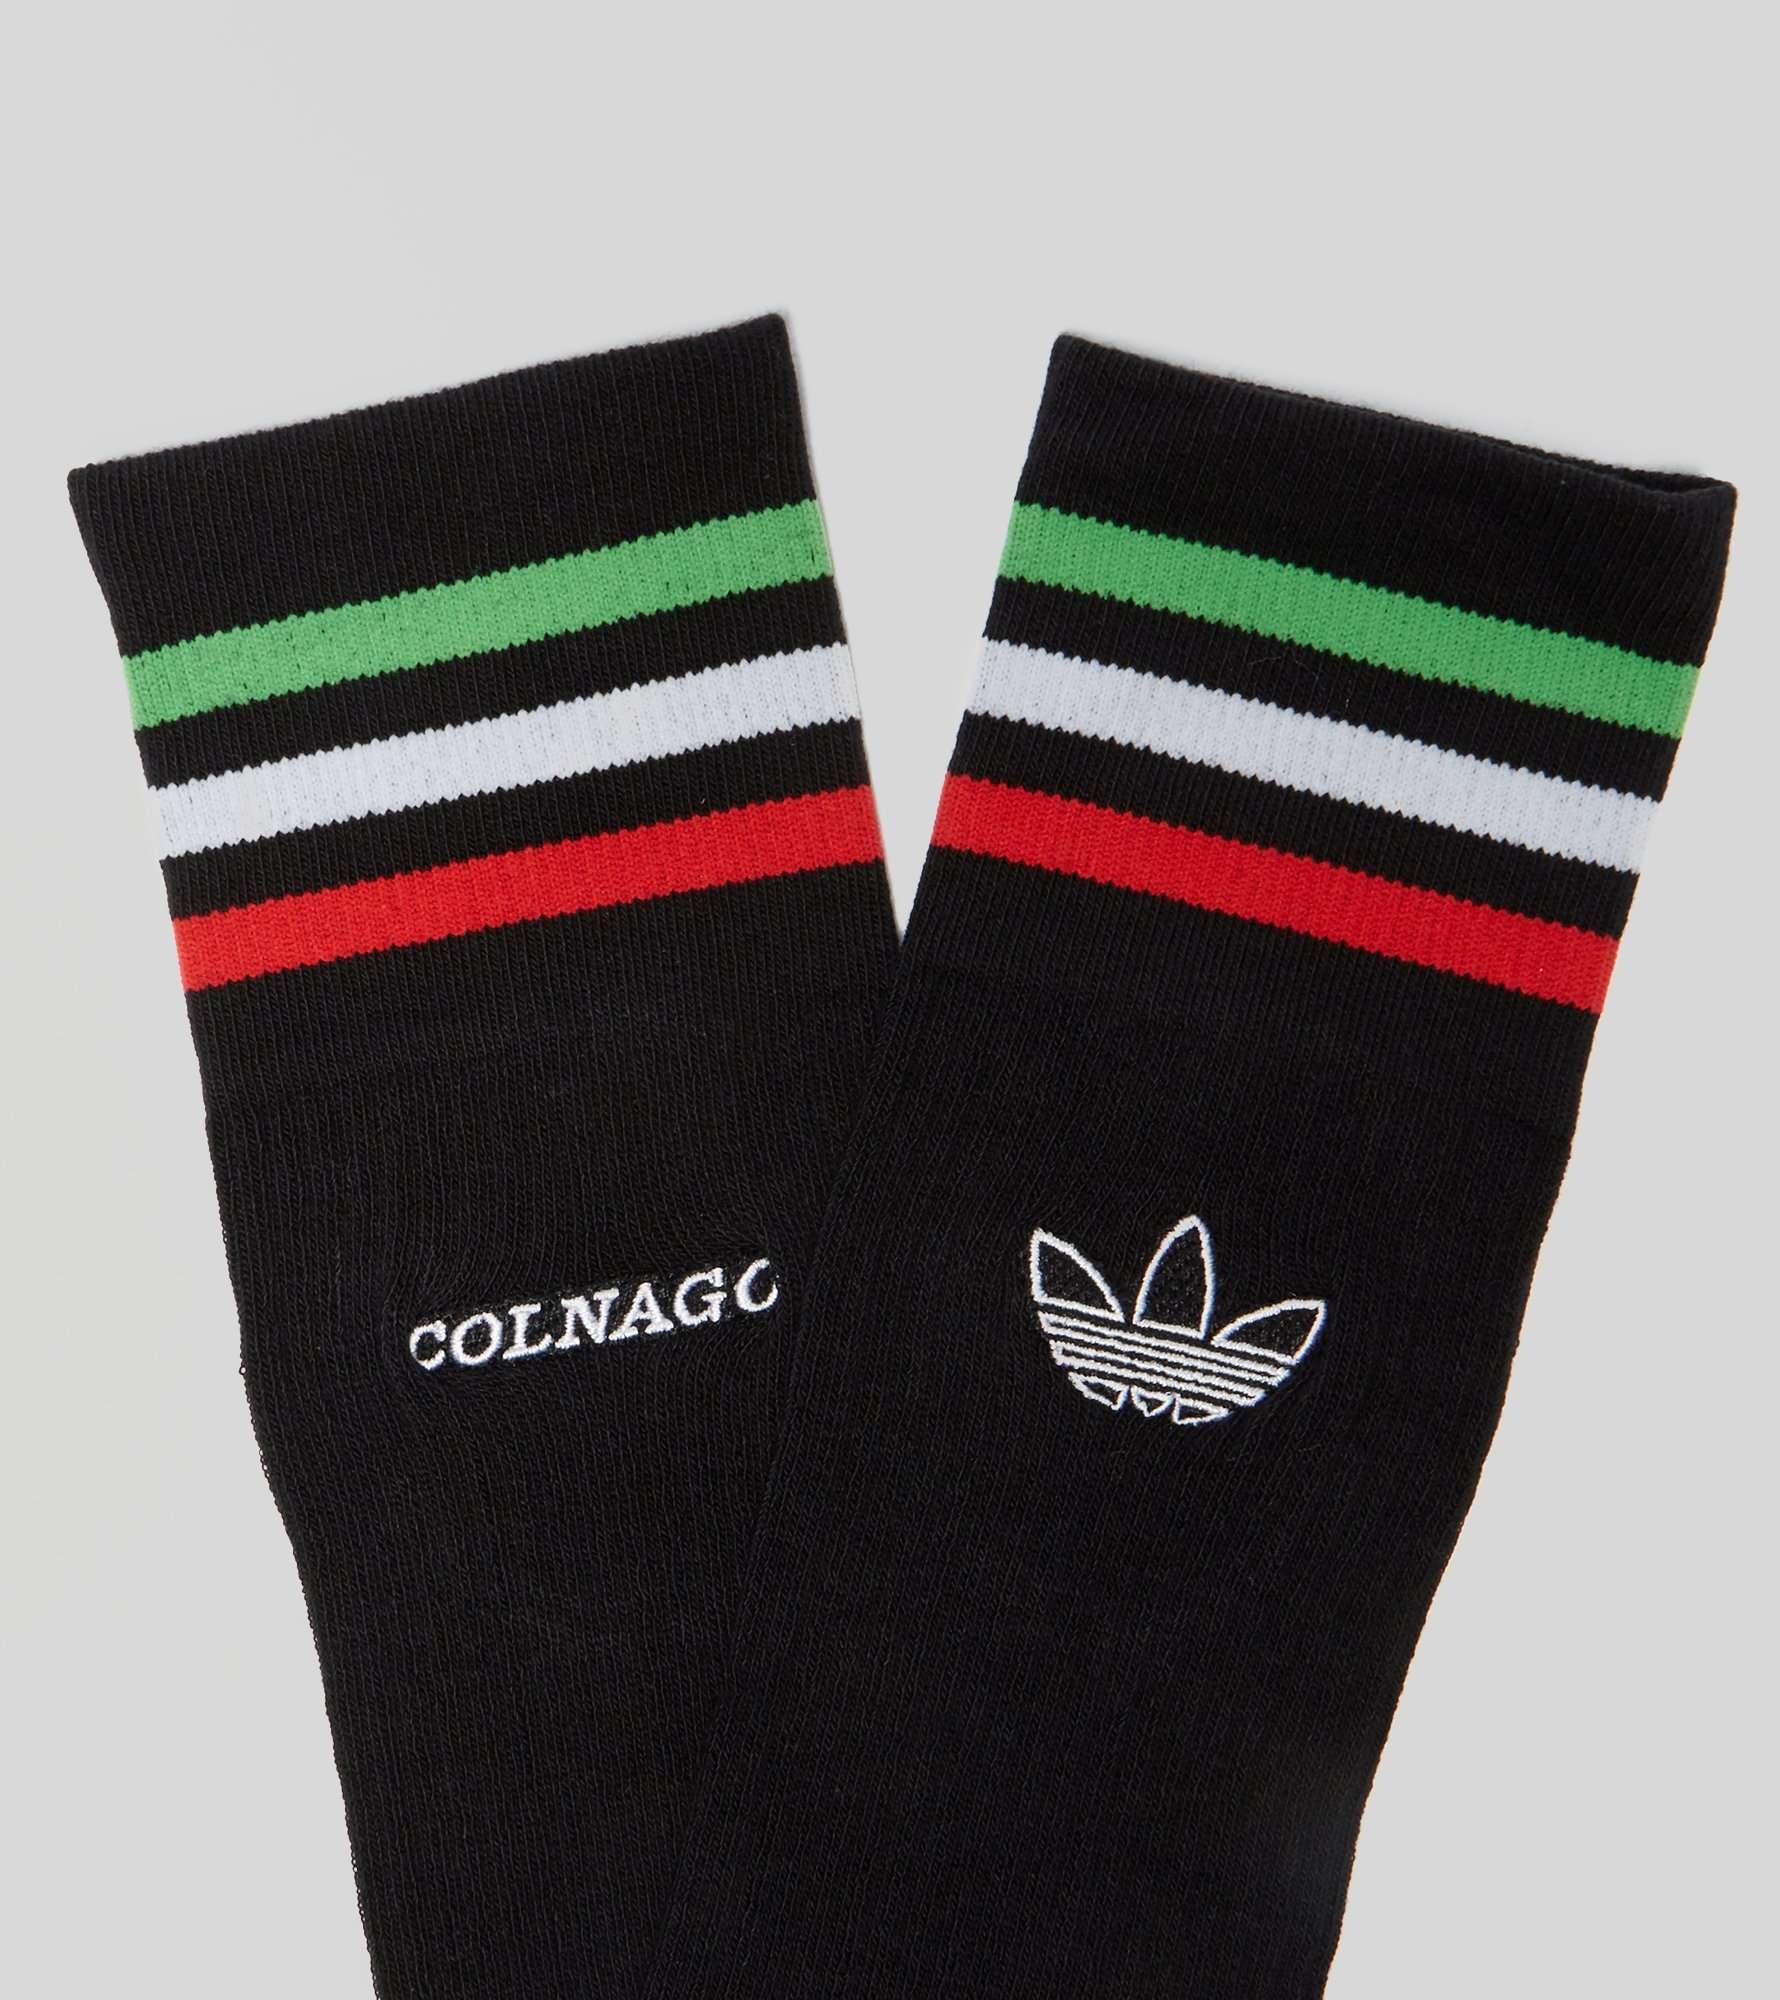 adidas Originals x Colnago Modern Accessories Pack